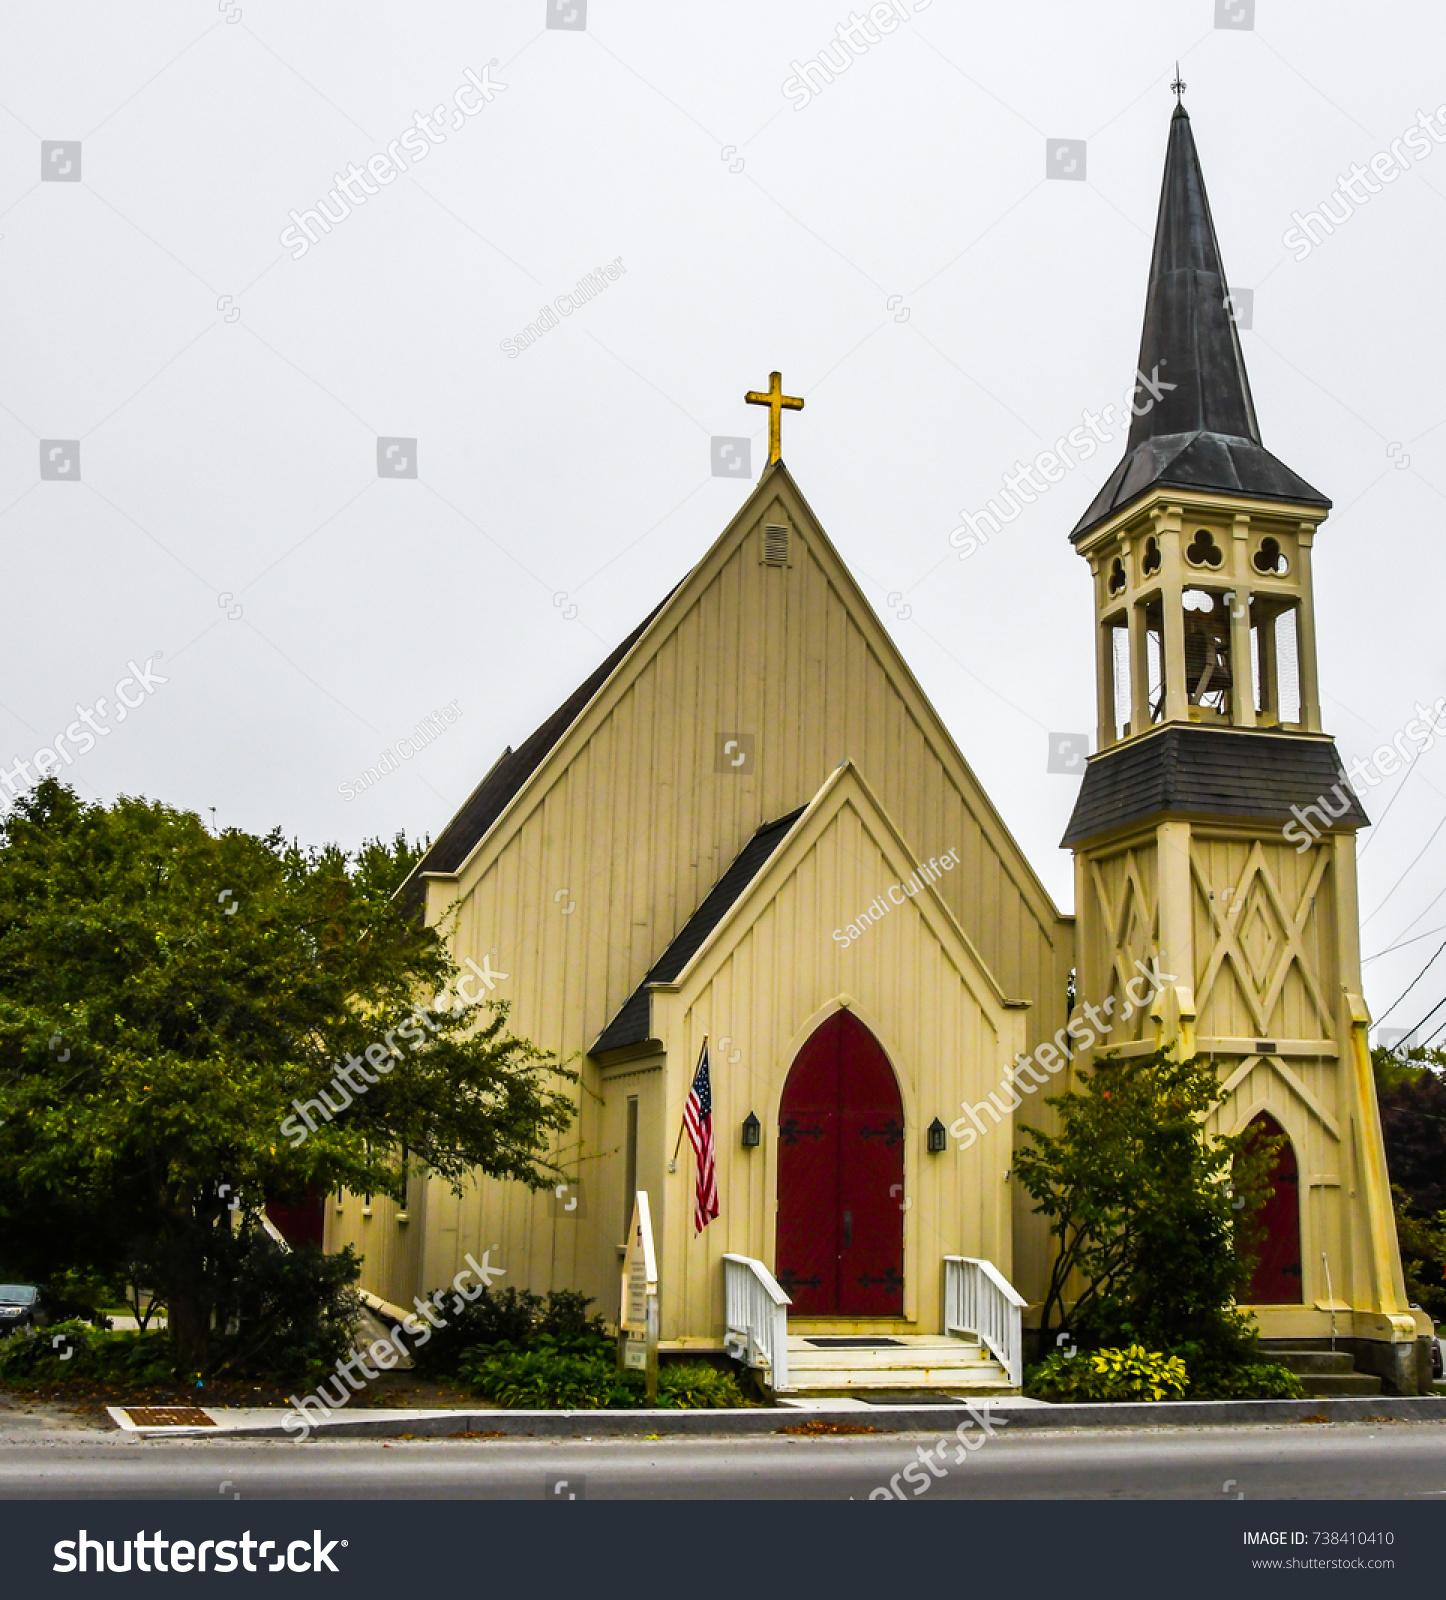 Red Front Door On Episcopal Church Stock Photo Edit Now 738410410